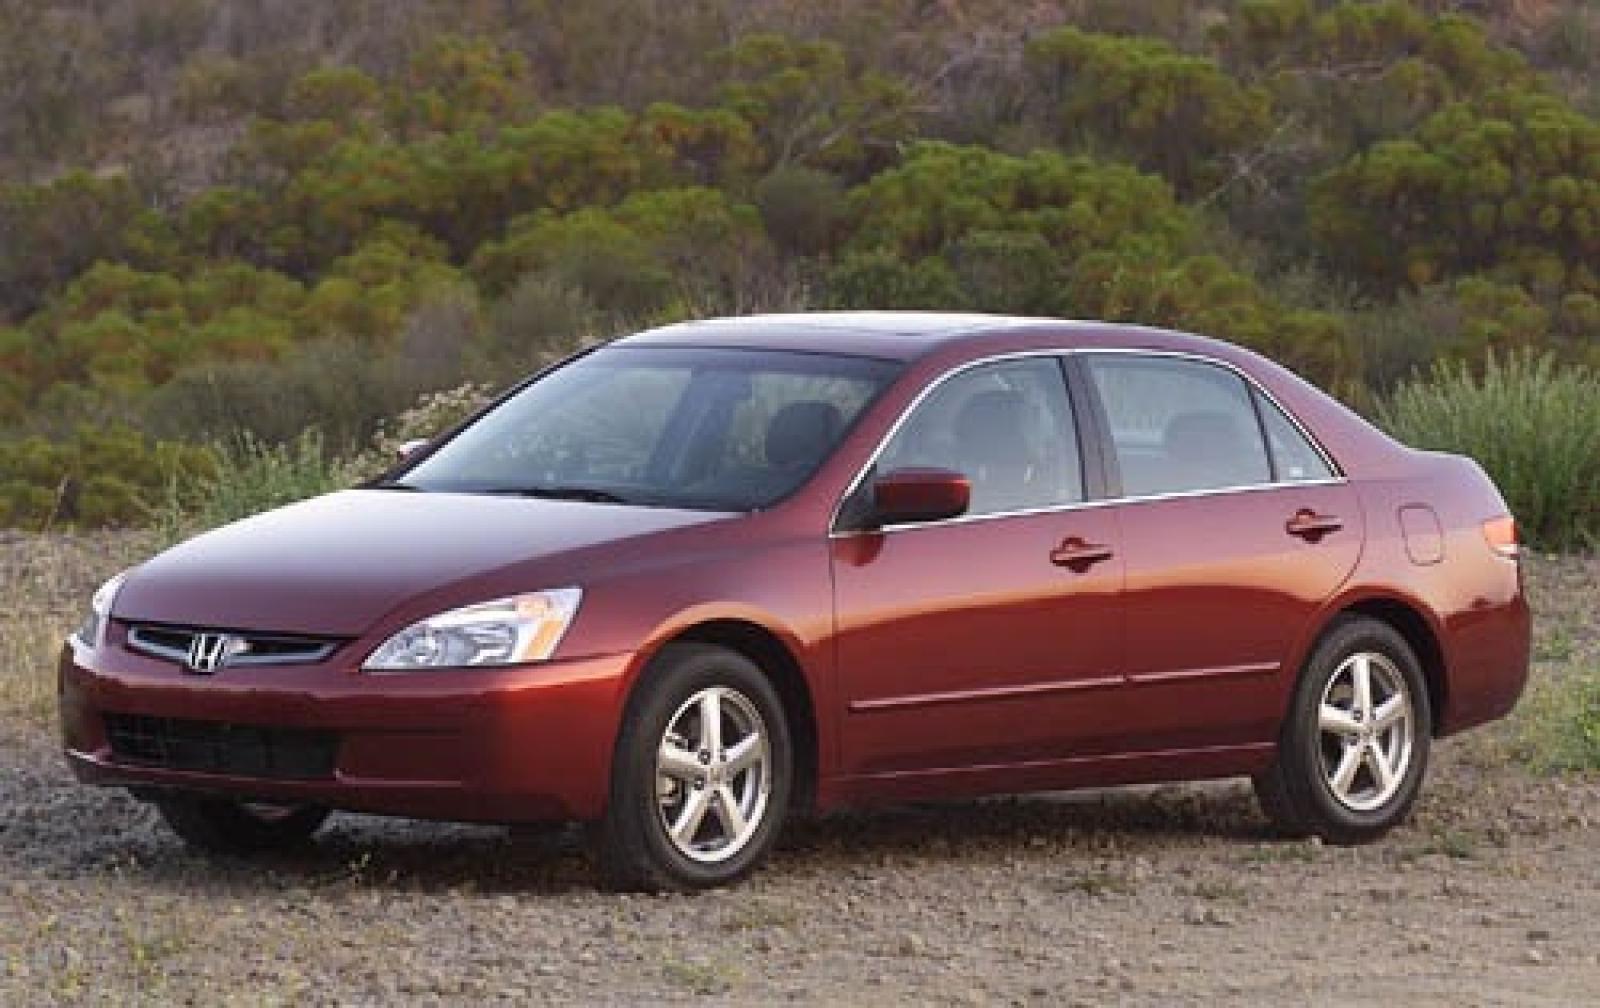 2004 Honda Accord #2